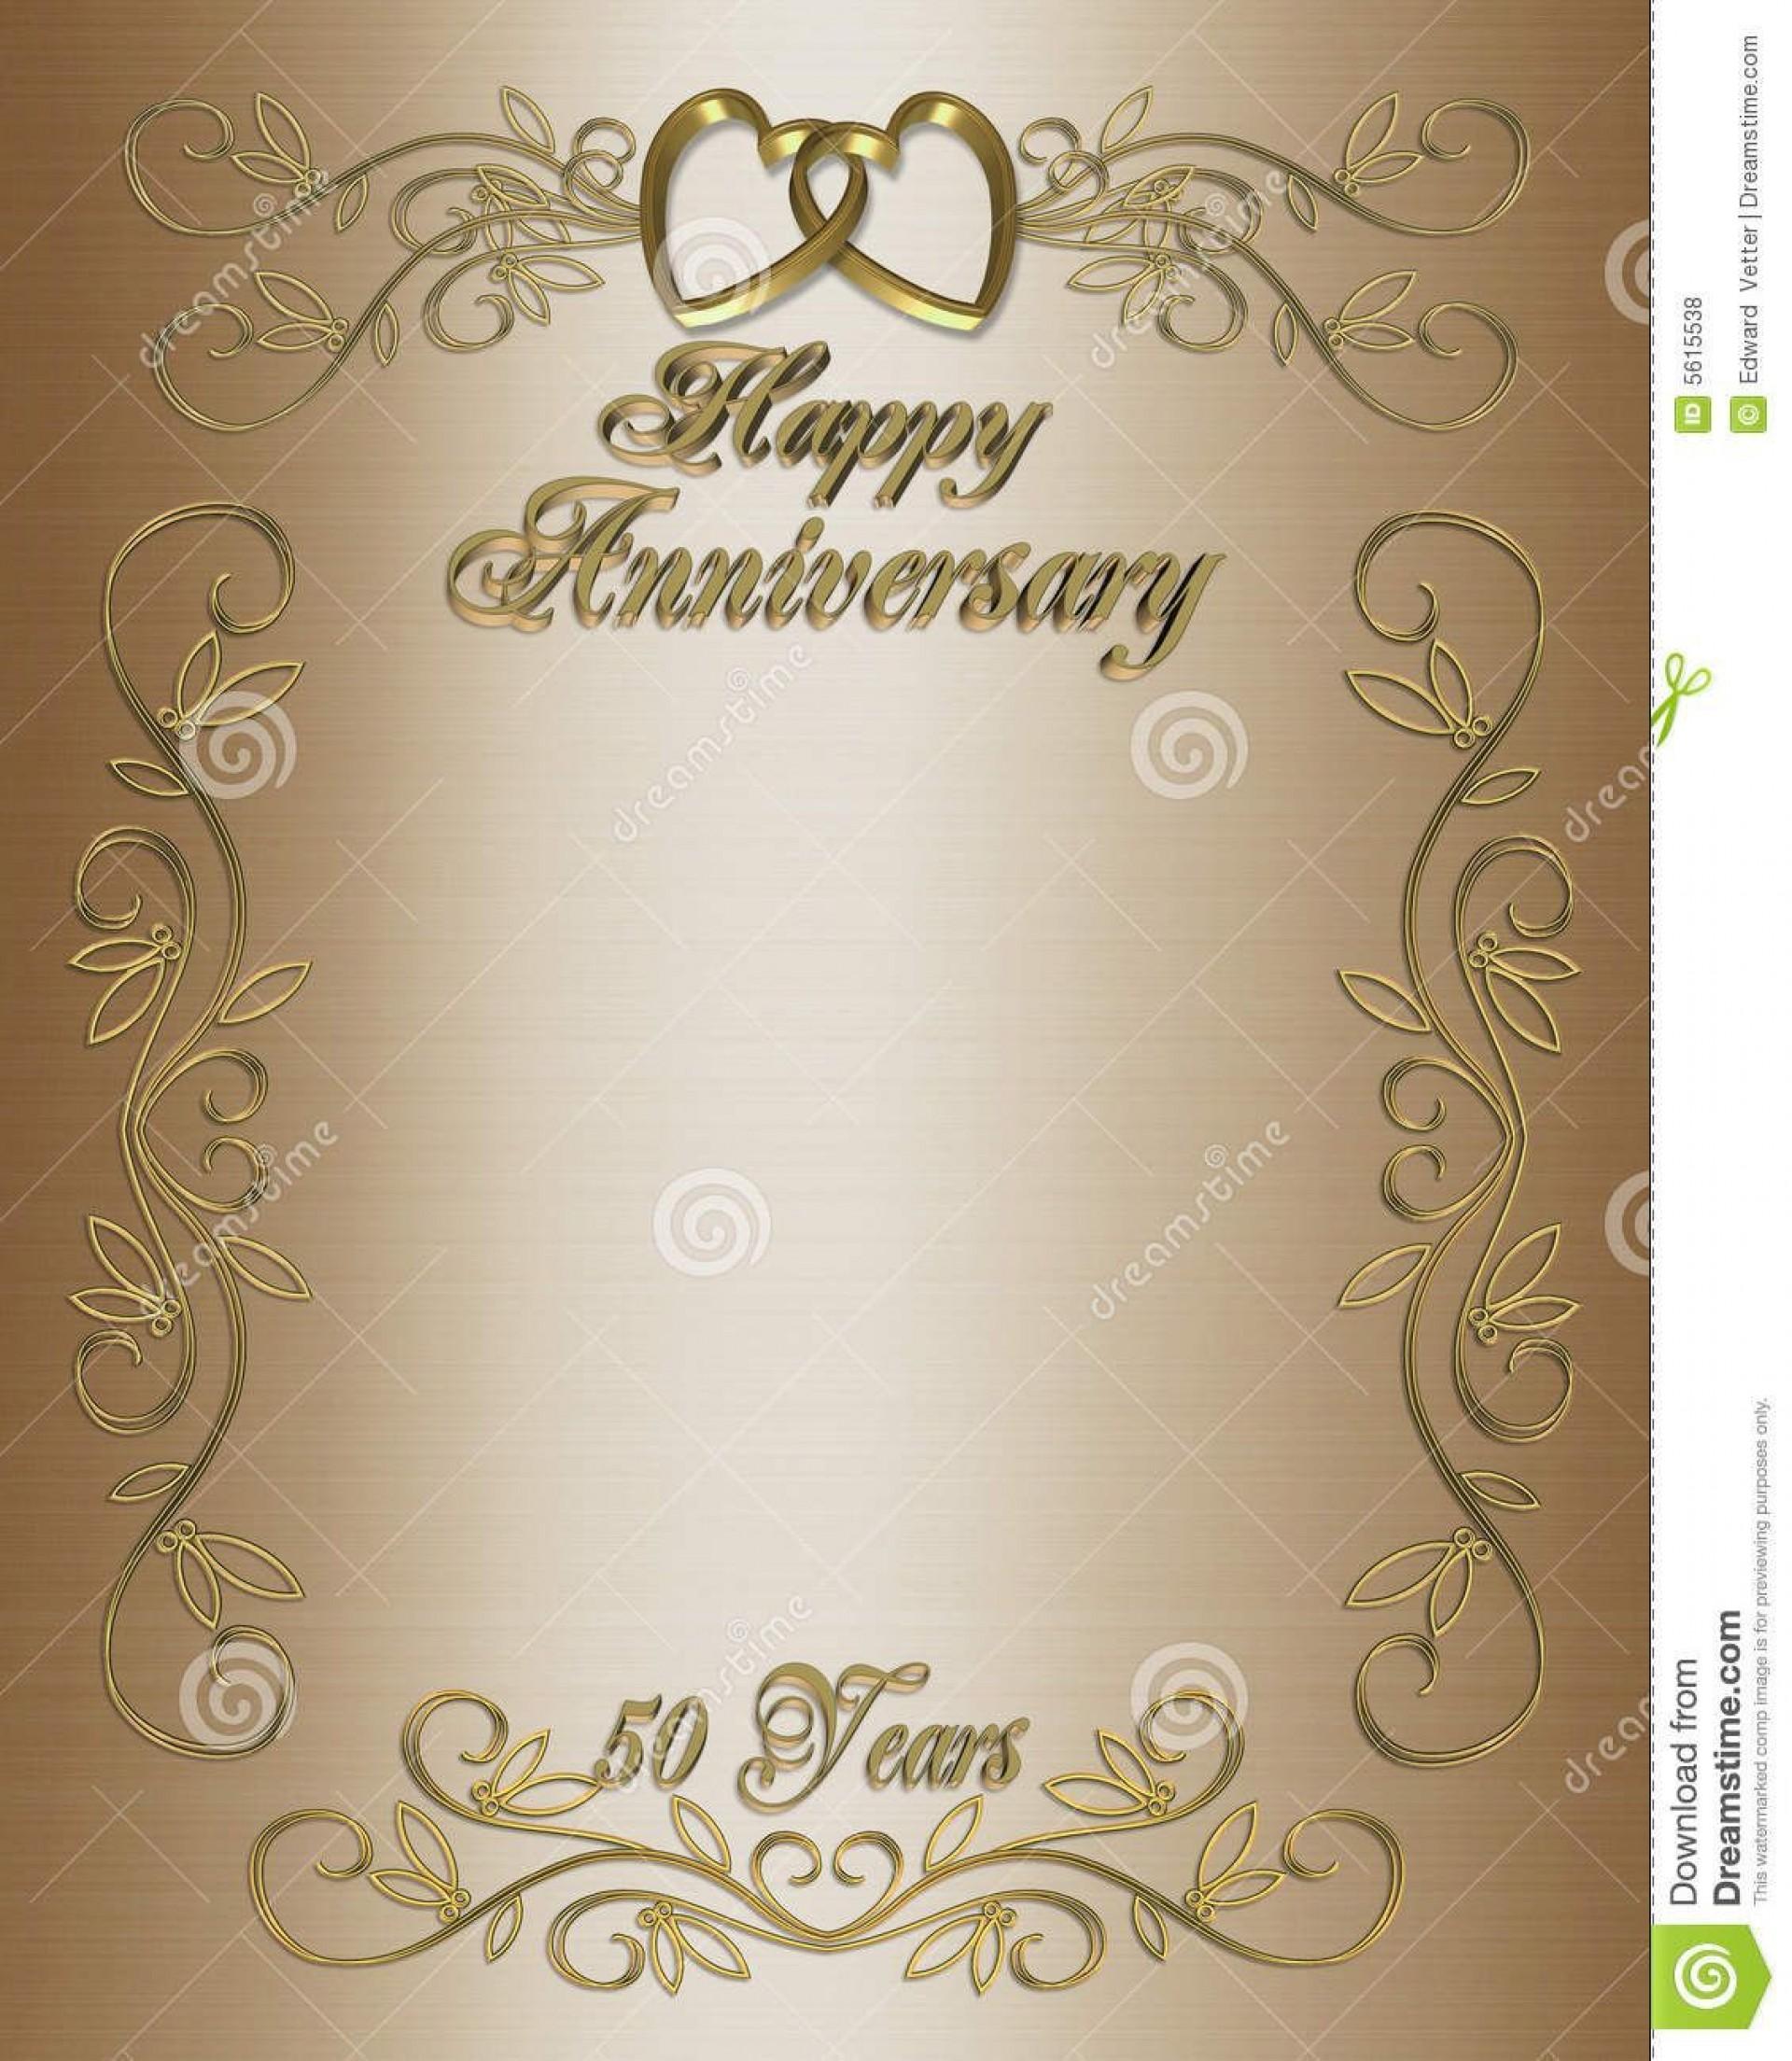 005 Dreaded 50th Wedding Anniversary Invitation Template Free High Def  Download Golden Microsoft Word1920